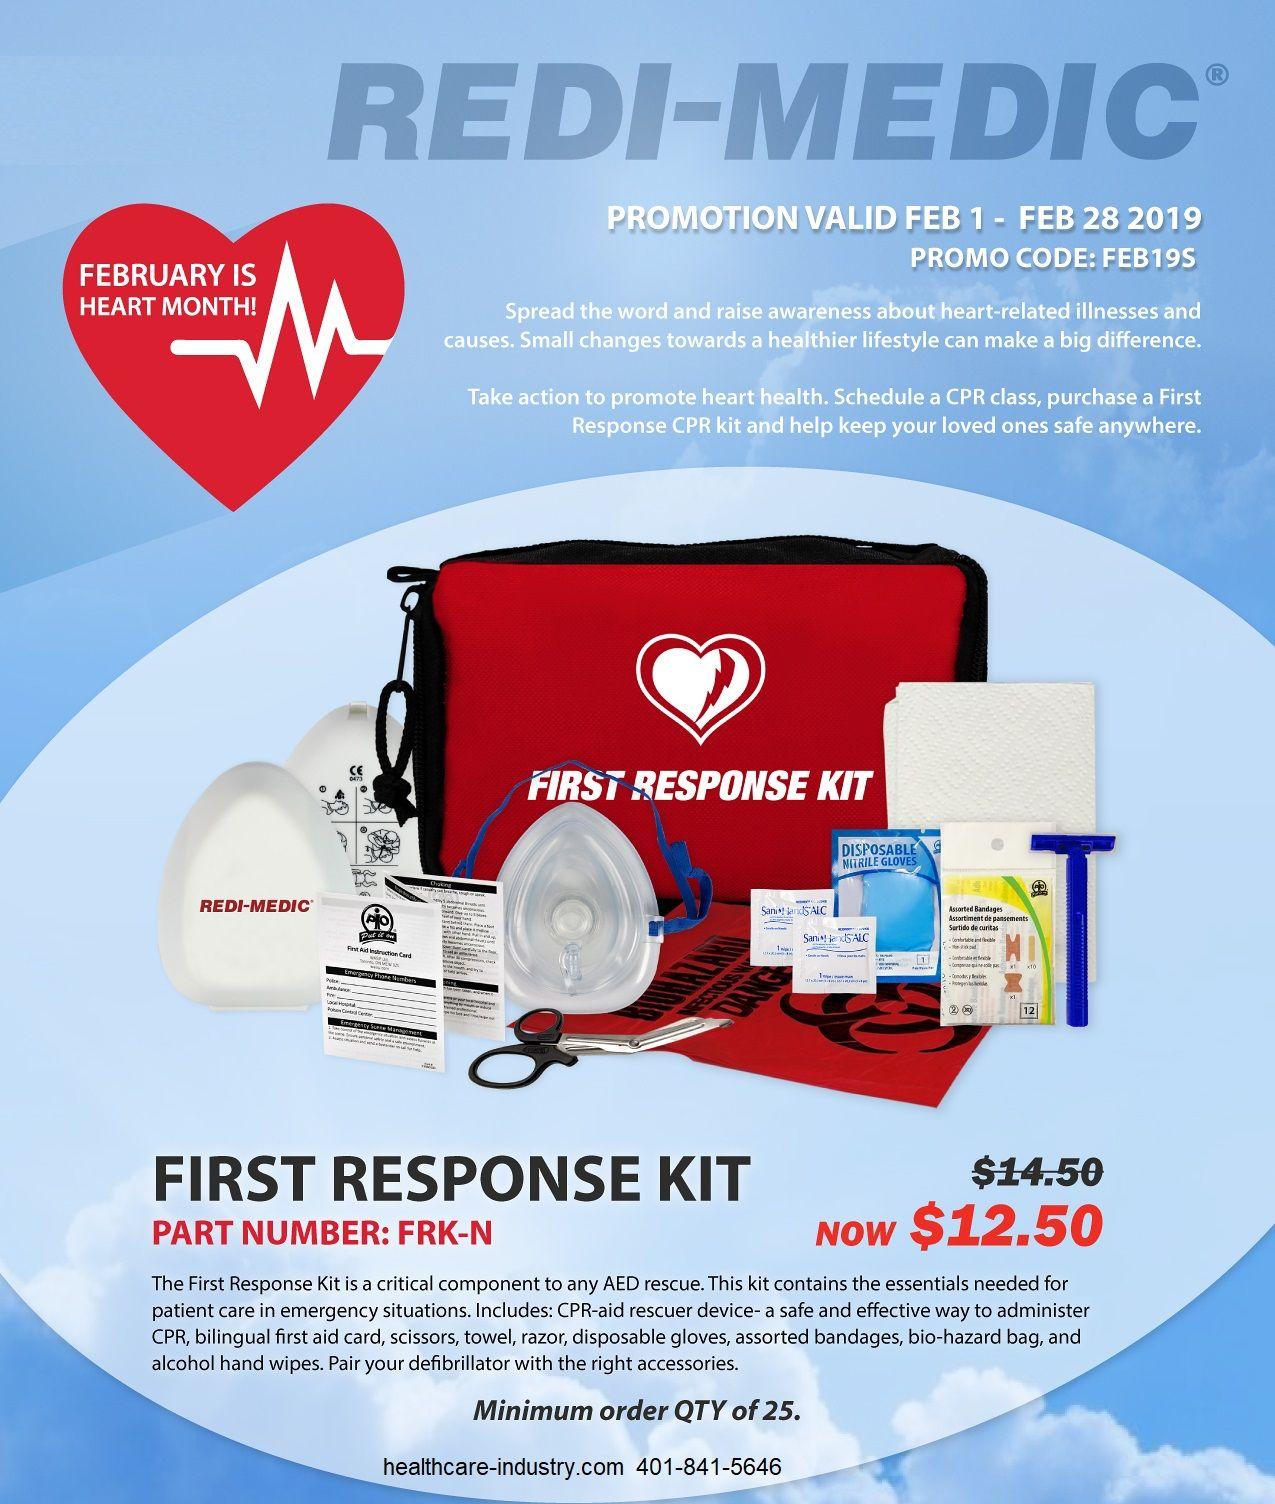 First Response Kit Sale! http//www.healthcareindustry